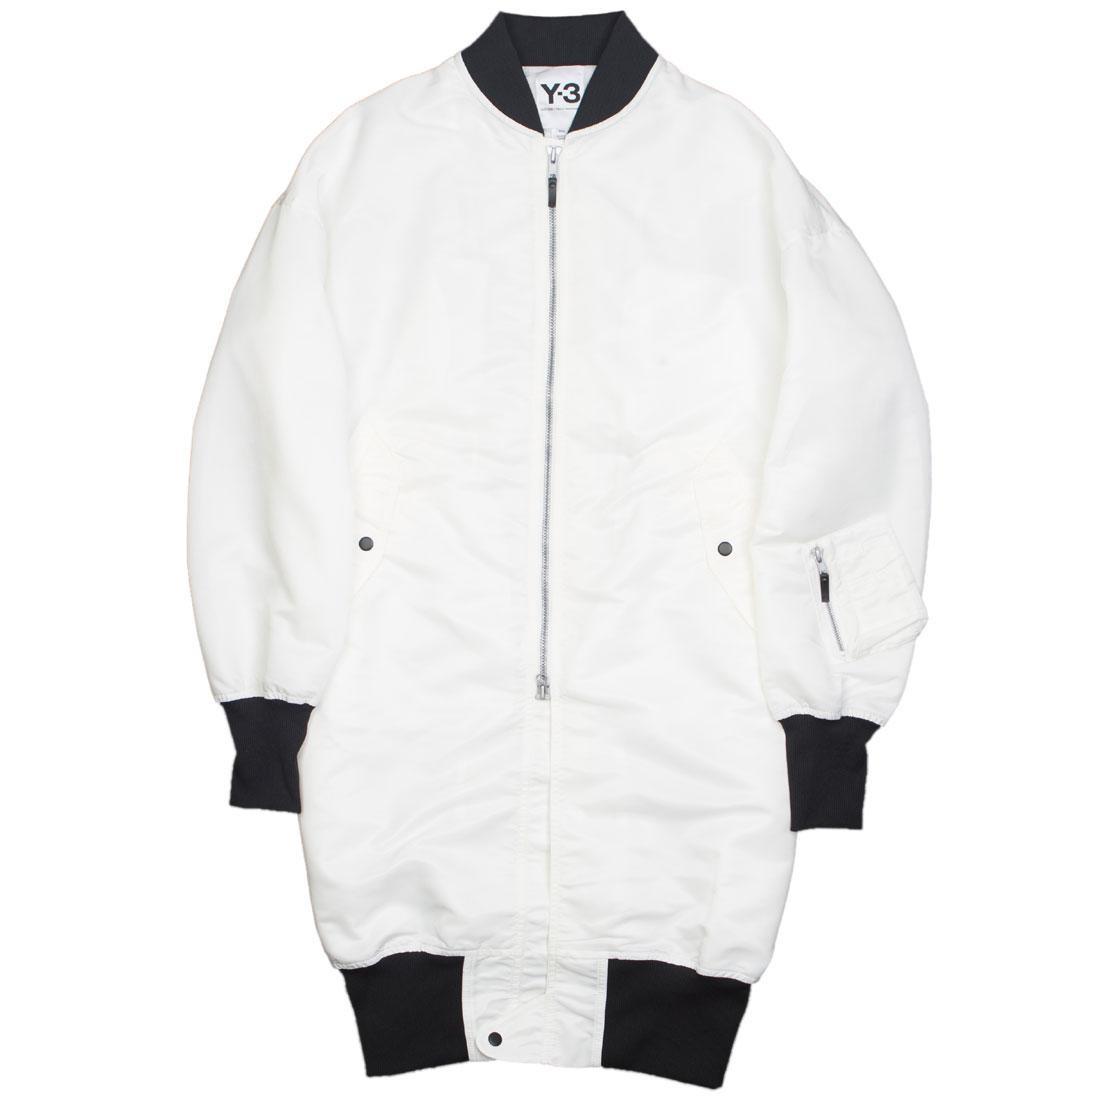 9ad9016d8a60 Adidas Y-3 Men Emblem Bomber Long Jacket white chalk white